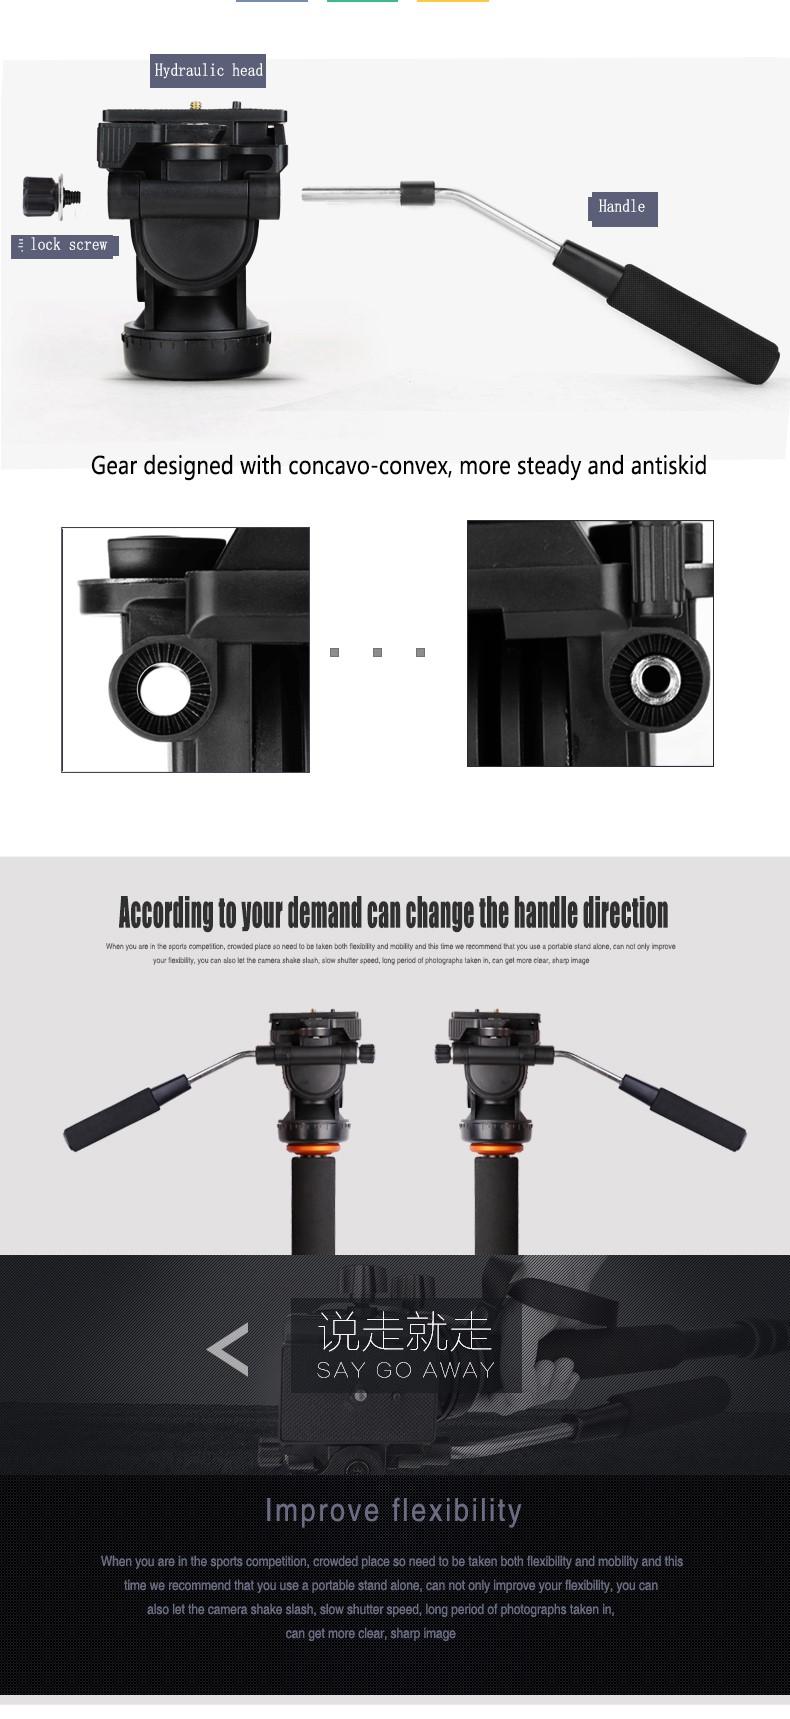 QZSD-Q238 Panhead handheld camera monopod digital and video yunteng berno OBO camera monopod photography accessories